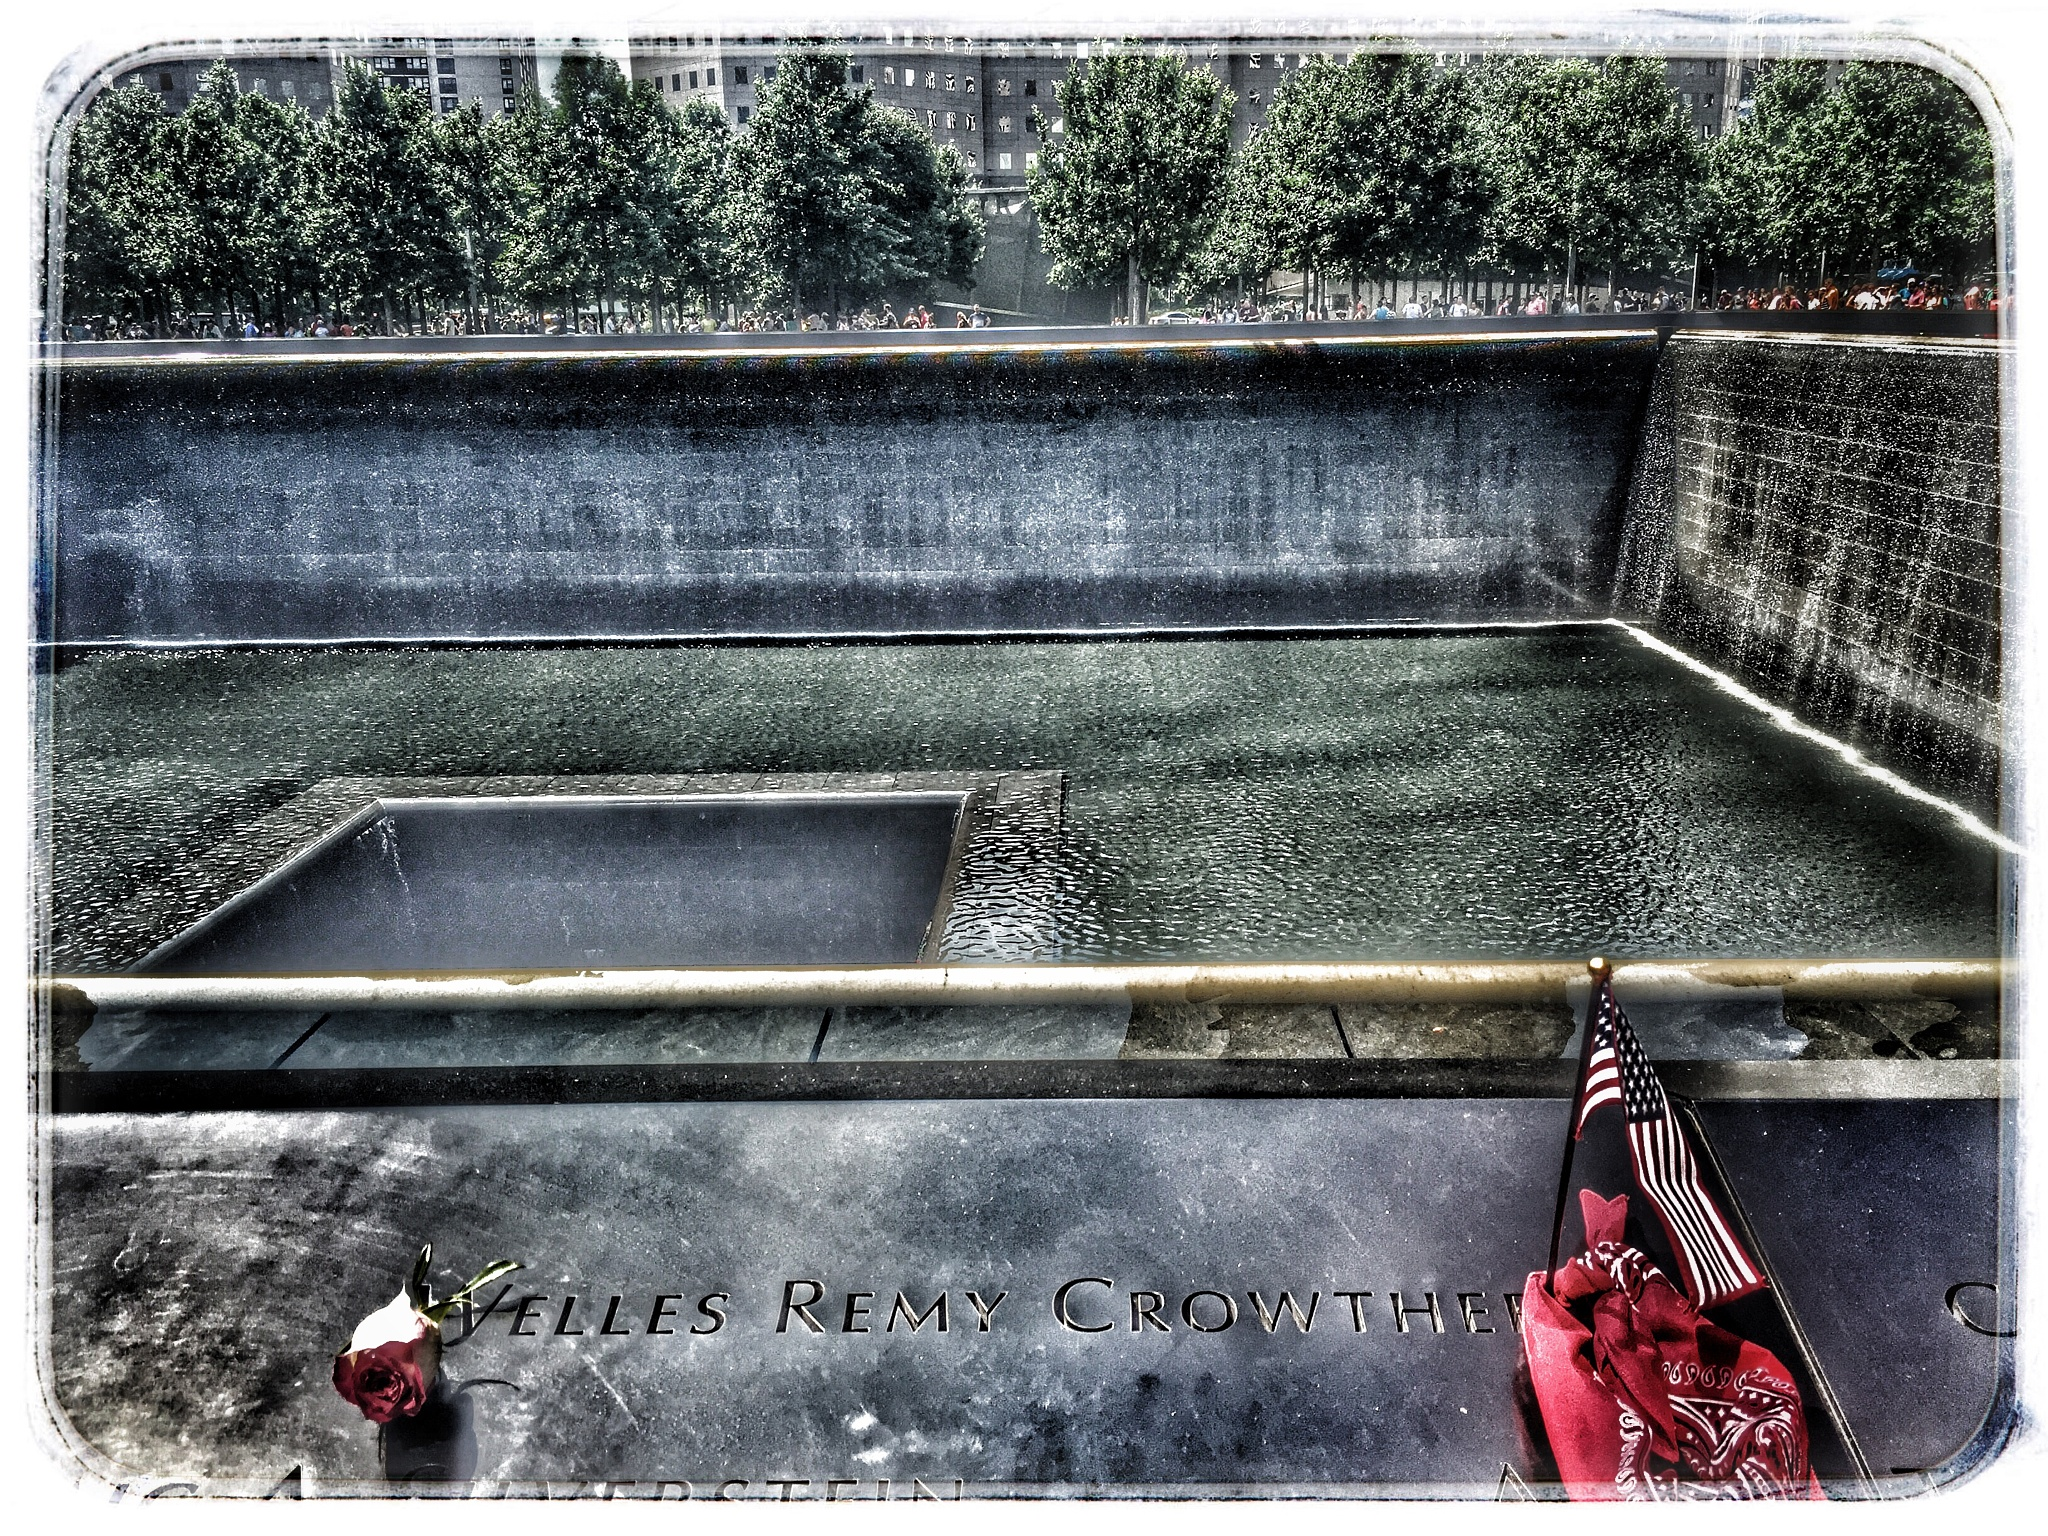 911 memorial  by pr_photoman